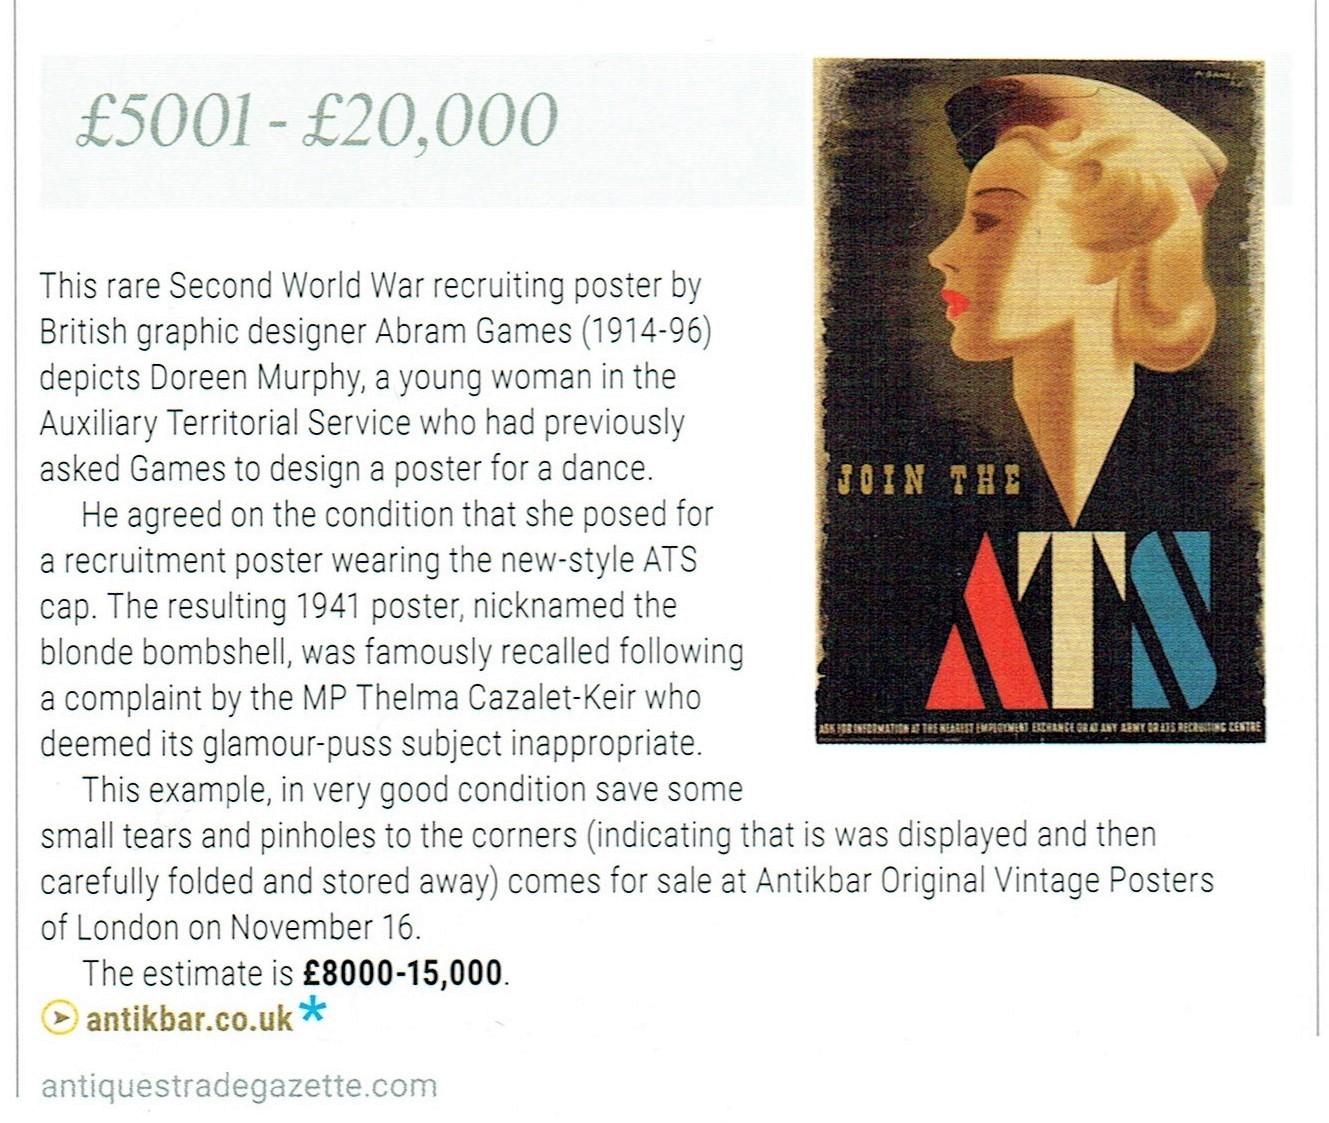 ATG Auction Previews p45 ATS AbramGames AntikBar Vintage Poster Auction 16November2019